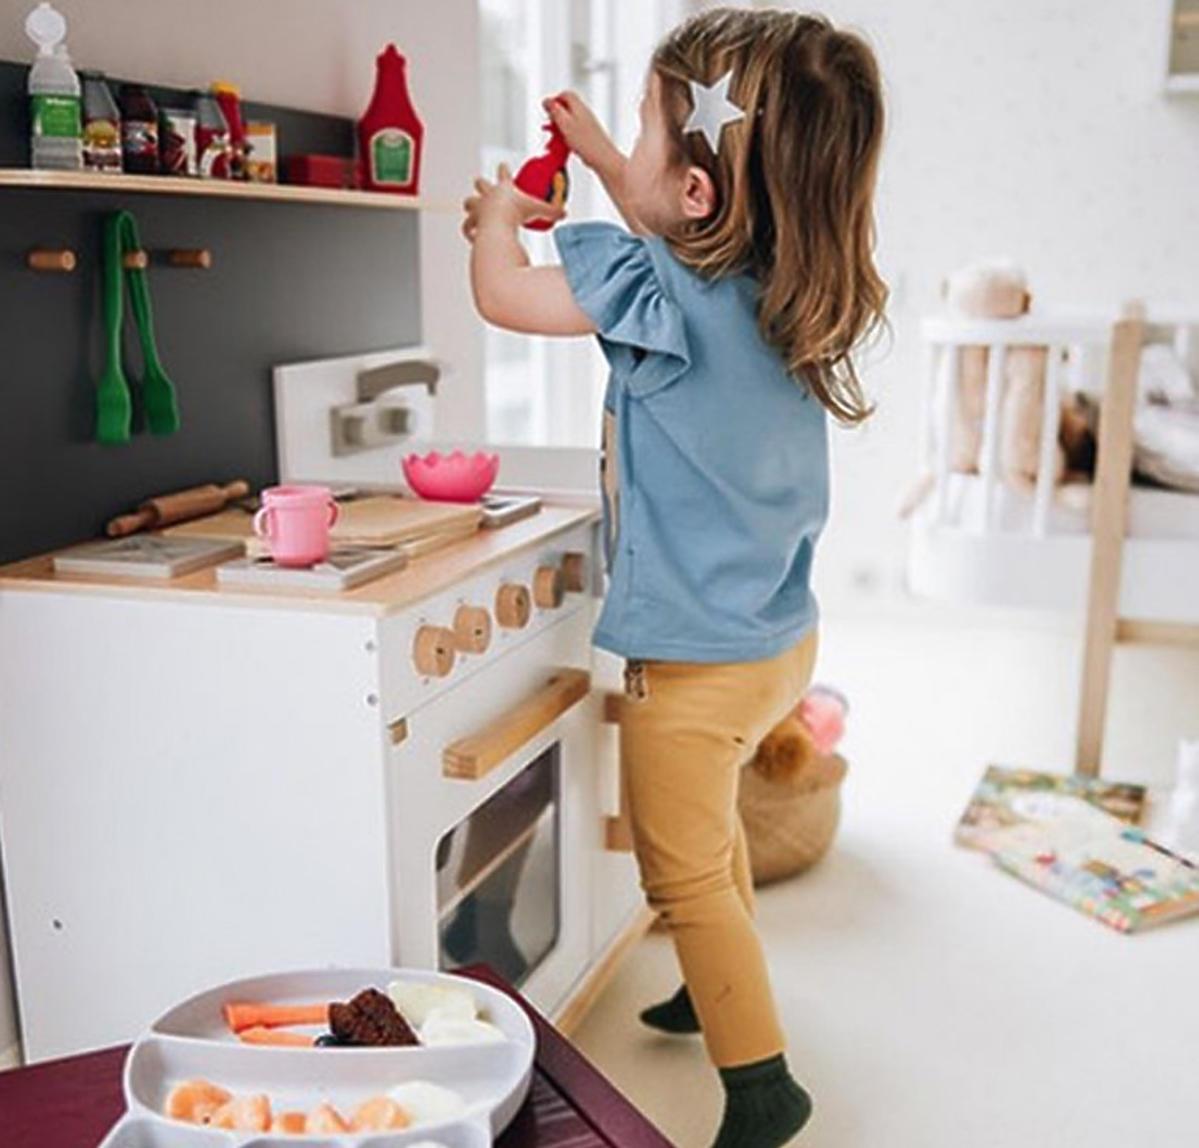 Klara Lewandowska i jej zabawkowa kuchnia